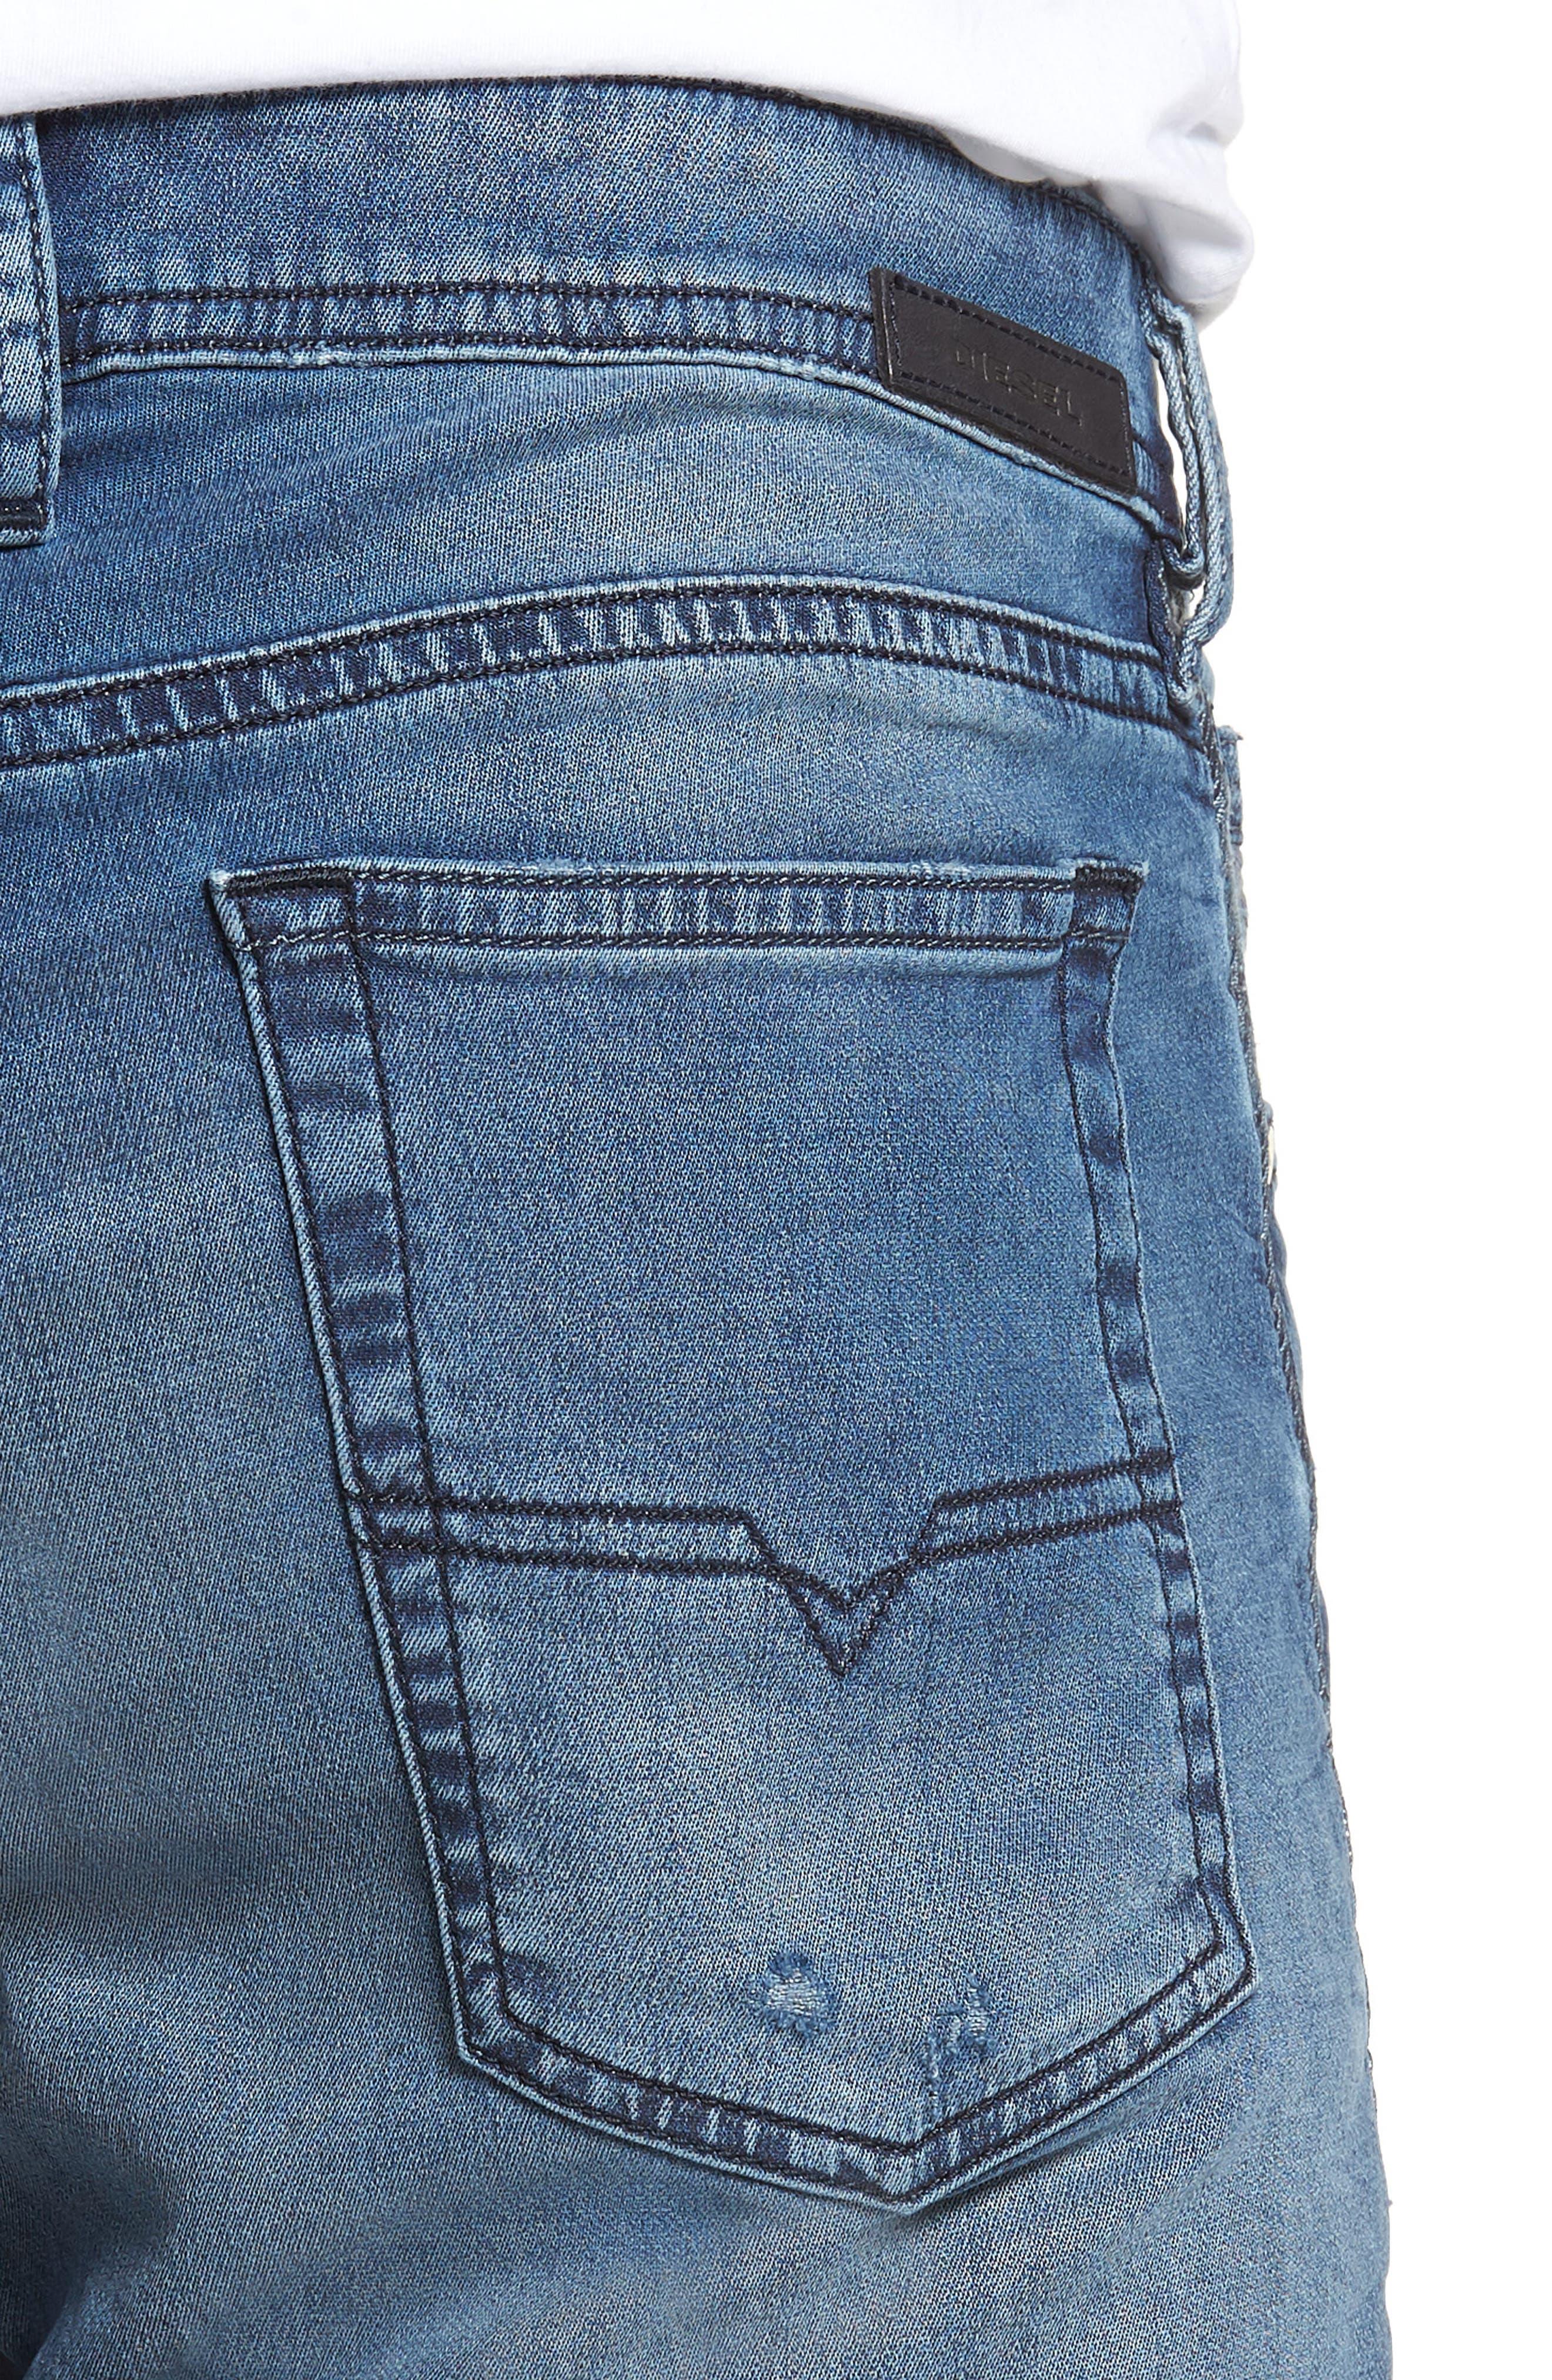 Bakari Skinny Fit Jeans,                             Alternate thumbnail 4, color,                             400